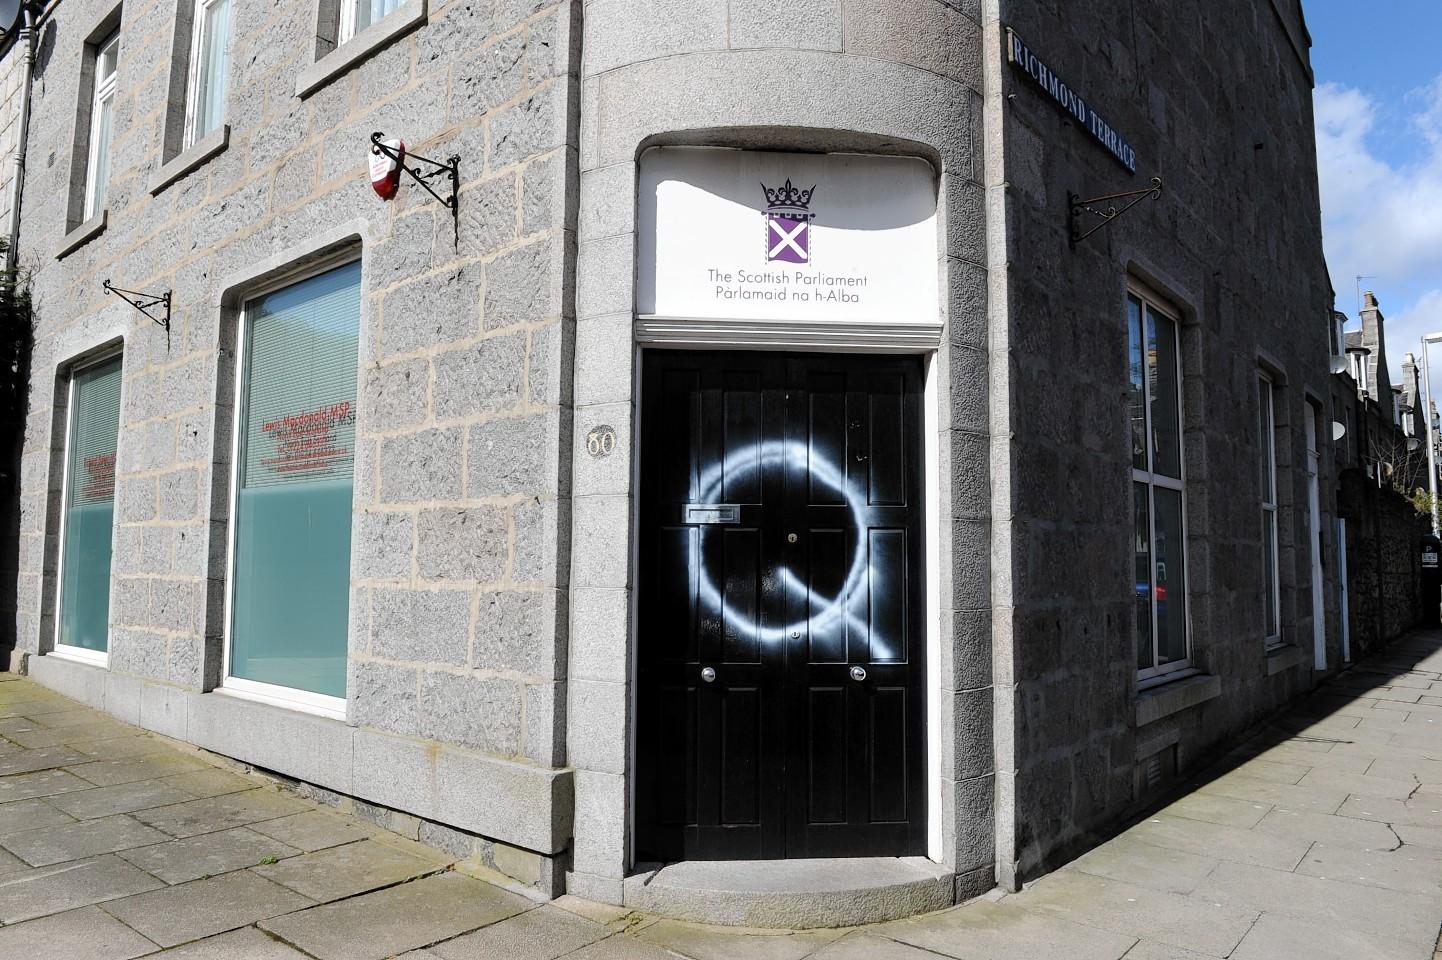 The-Scottish-Parliament-office